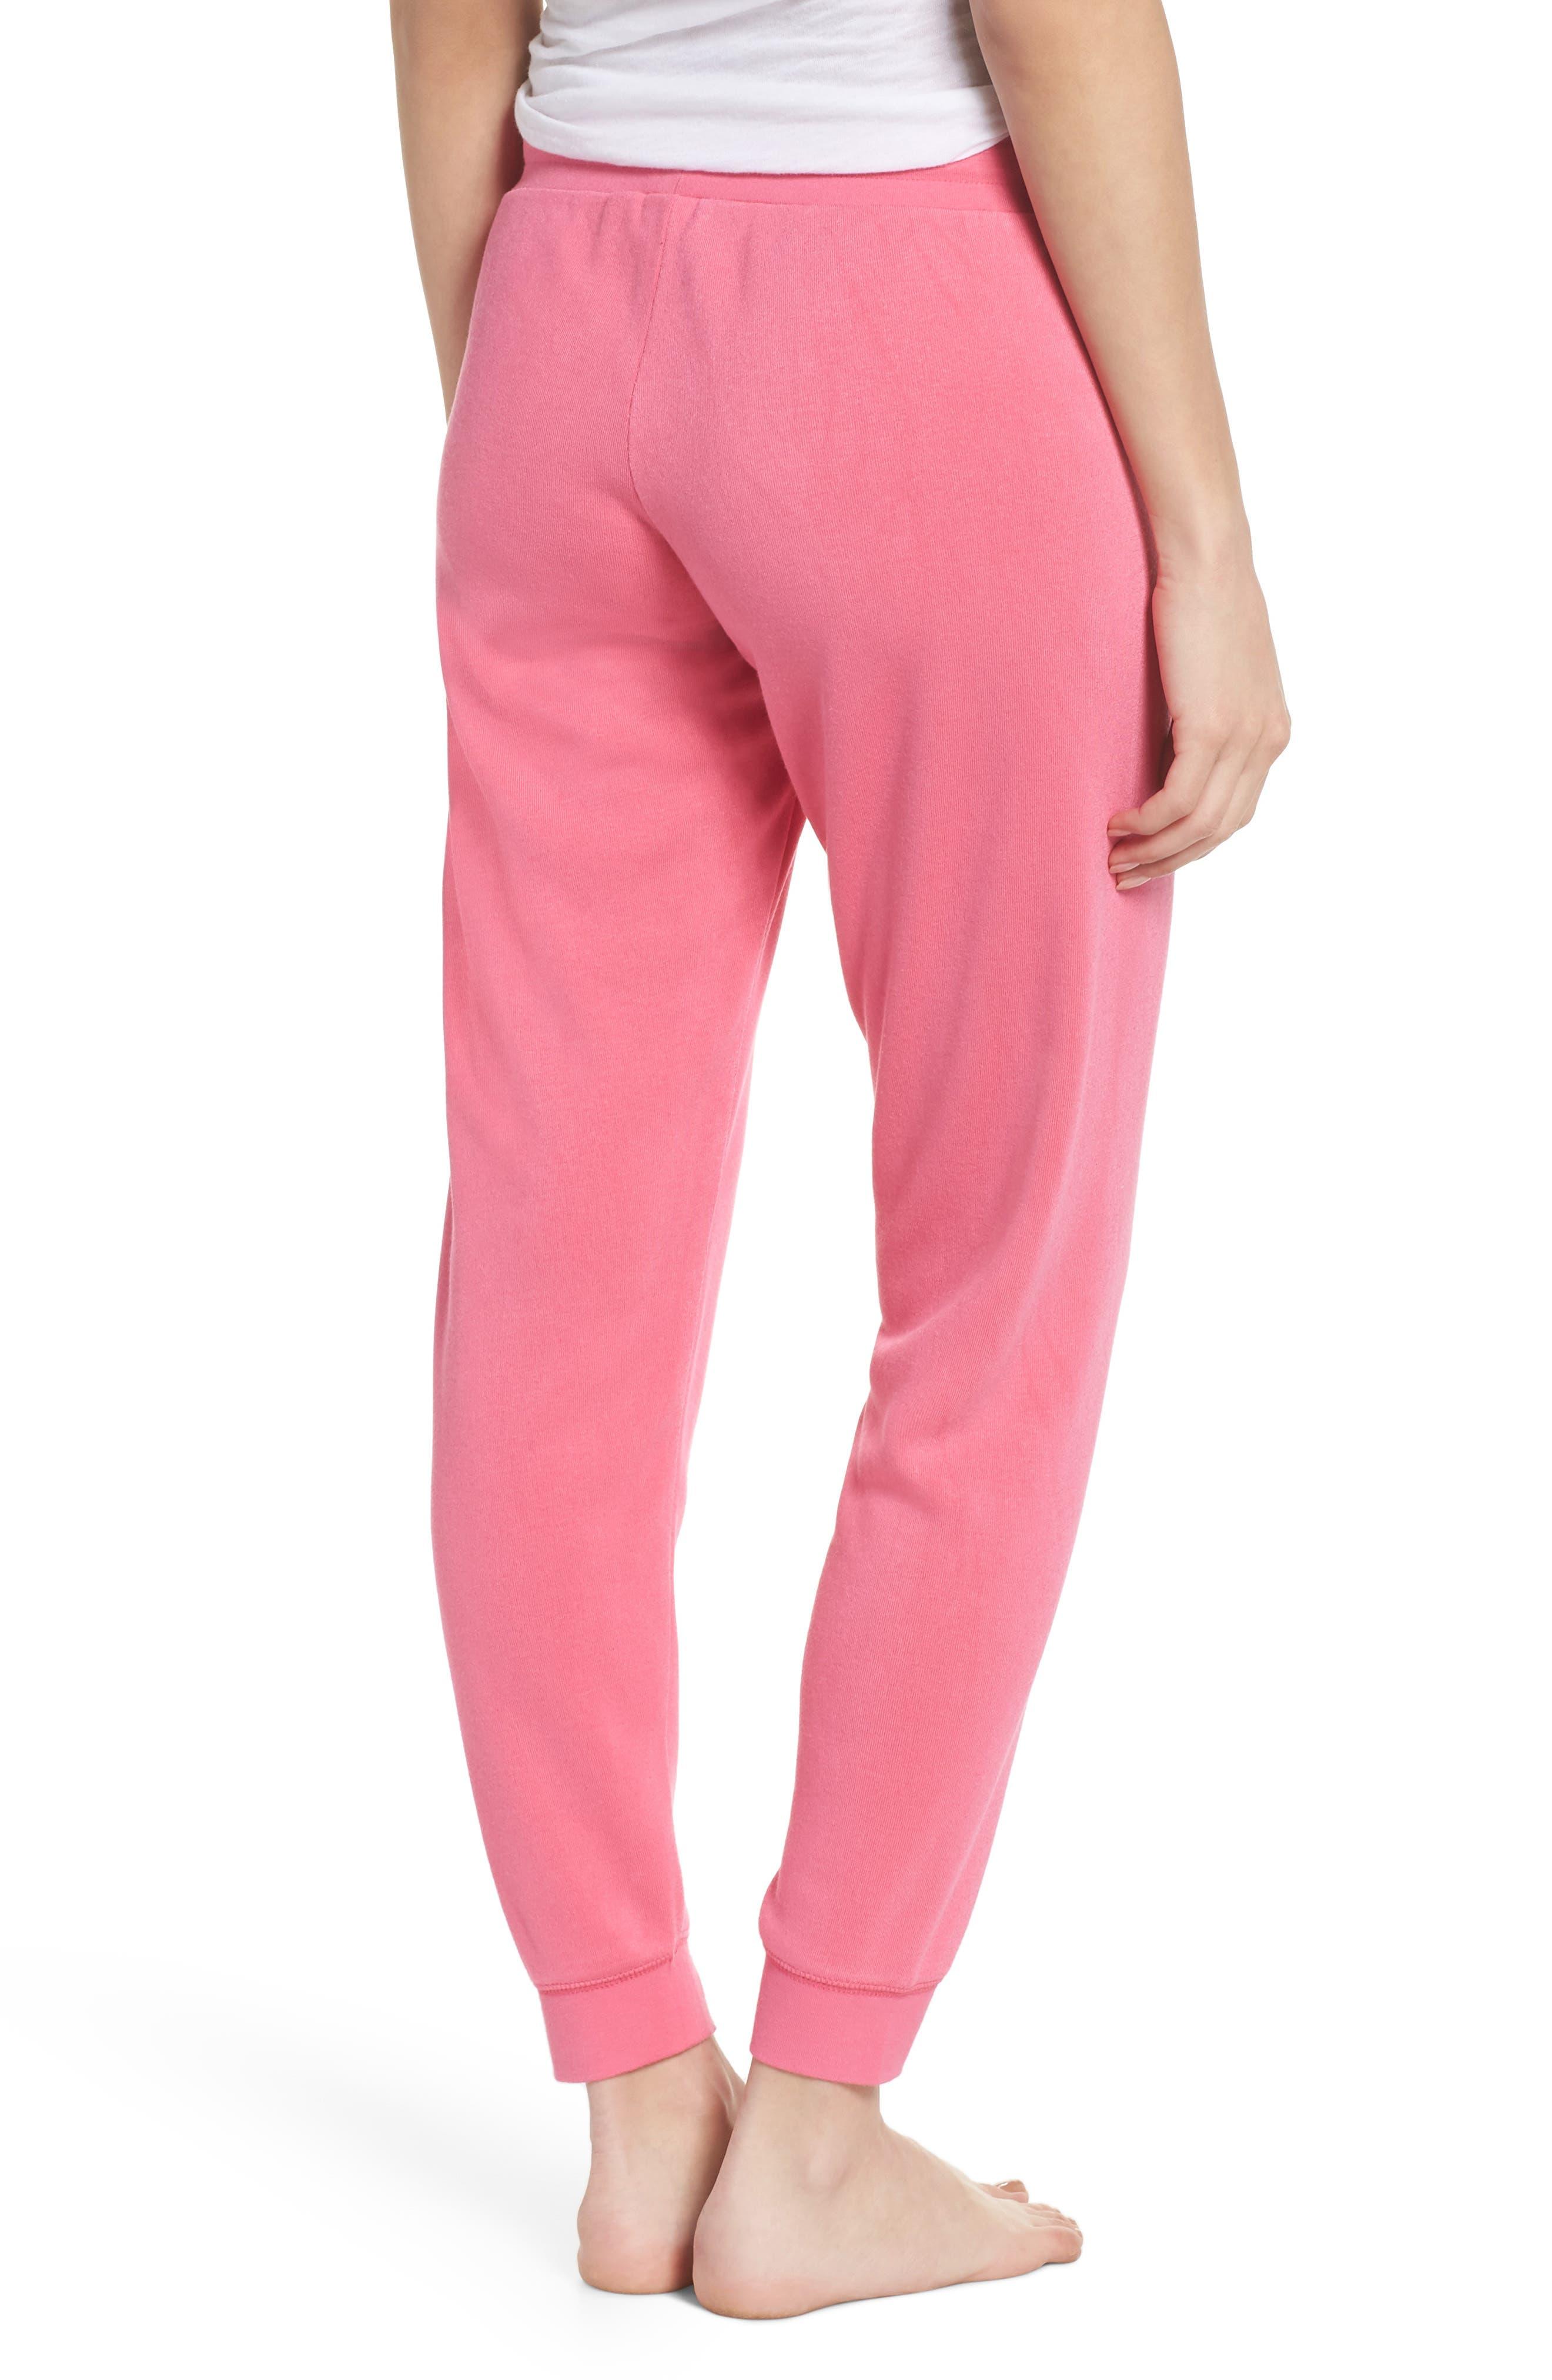 Firecracker Jogger Pajama Pants,                             Alternate thumbnail 2, color,                             Pink Fandango